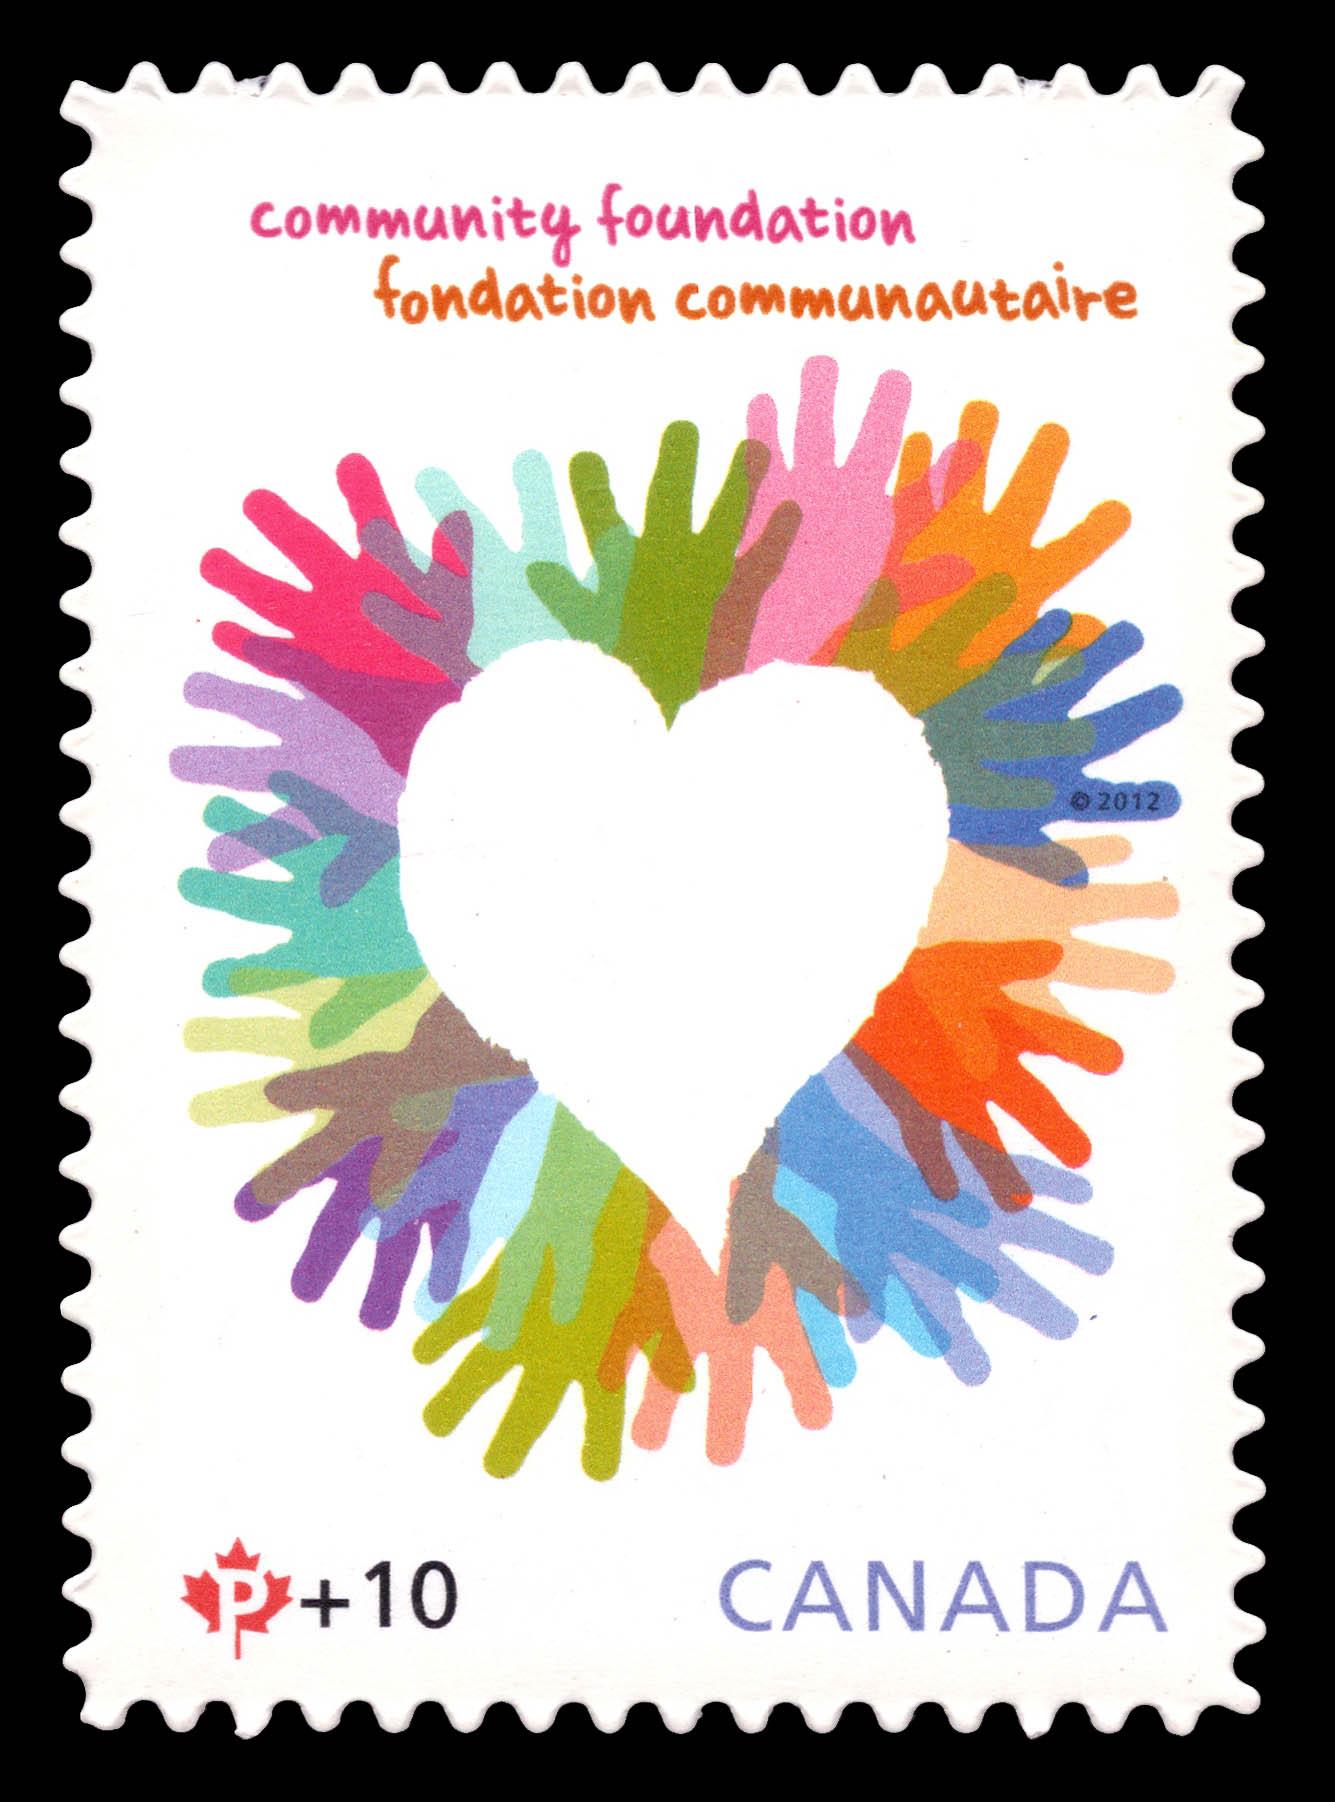 Canada Post Community Foundation Canada Postage Stamp